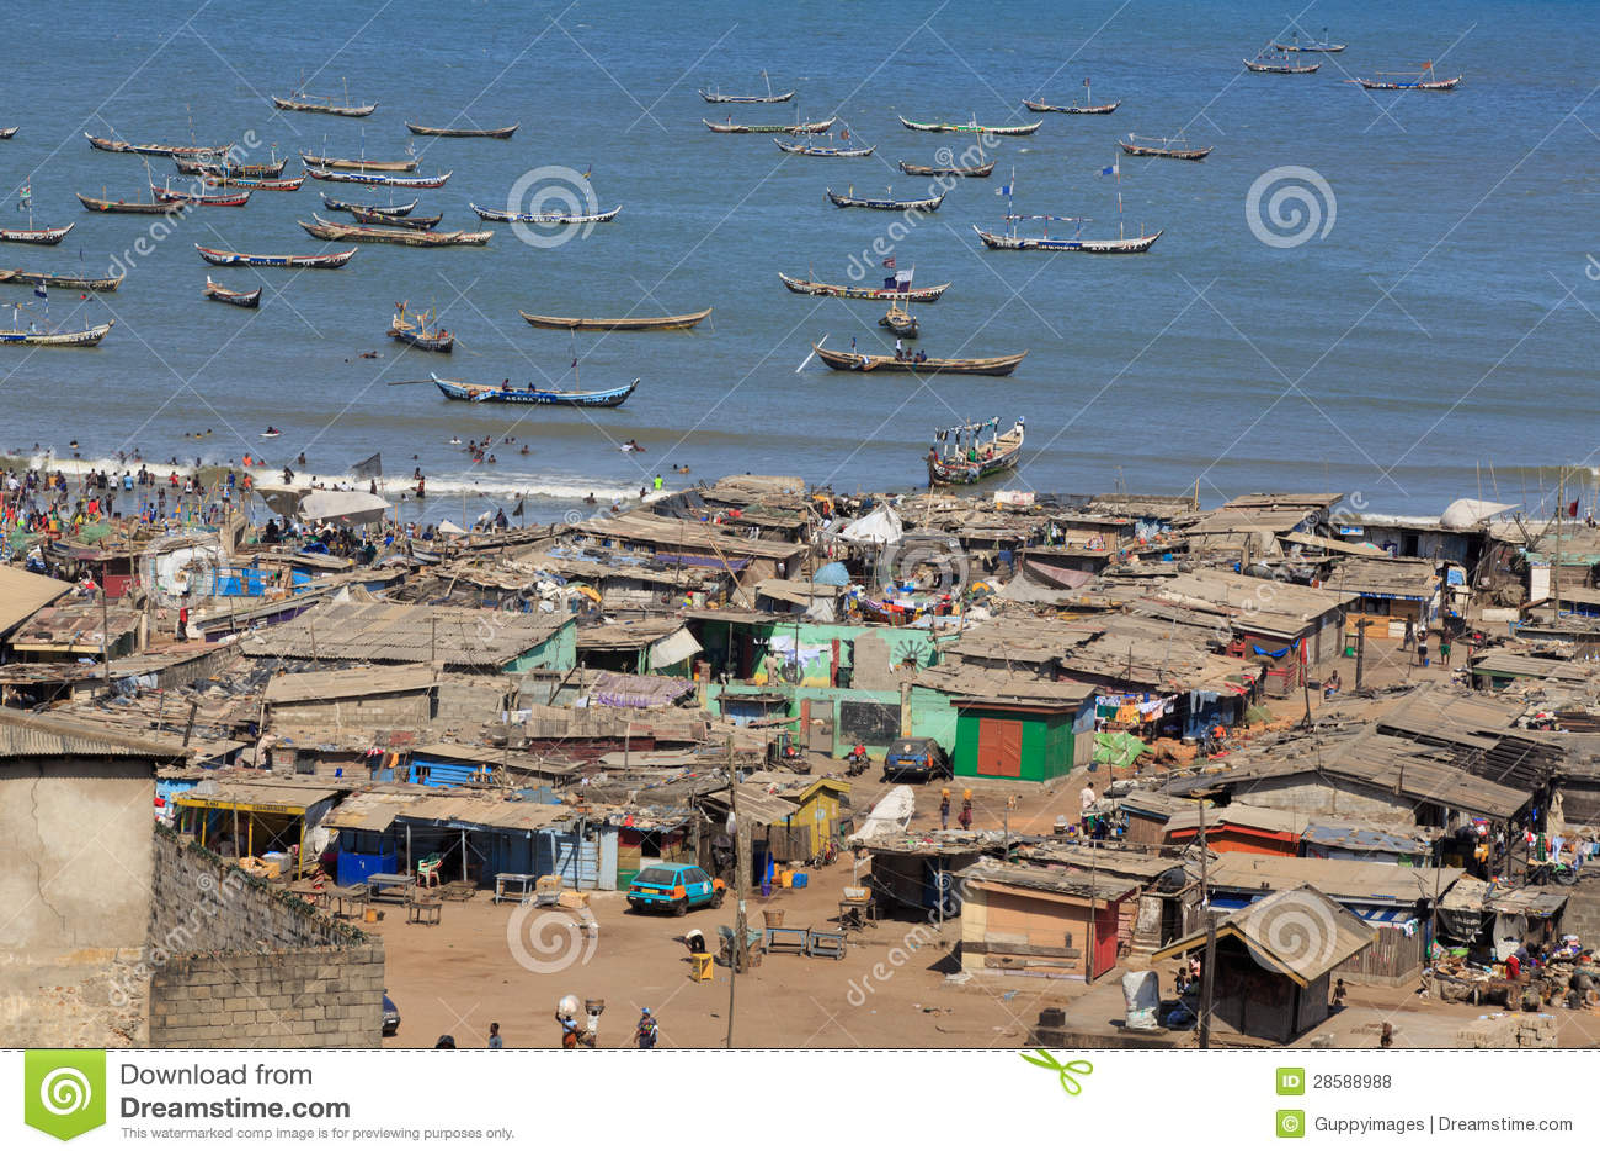 Degradado de Jamestown na praia